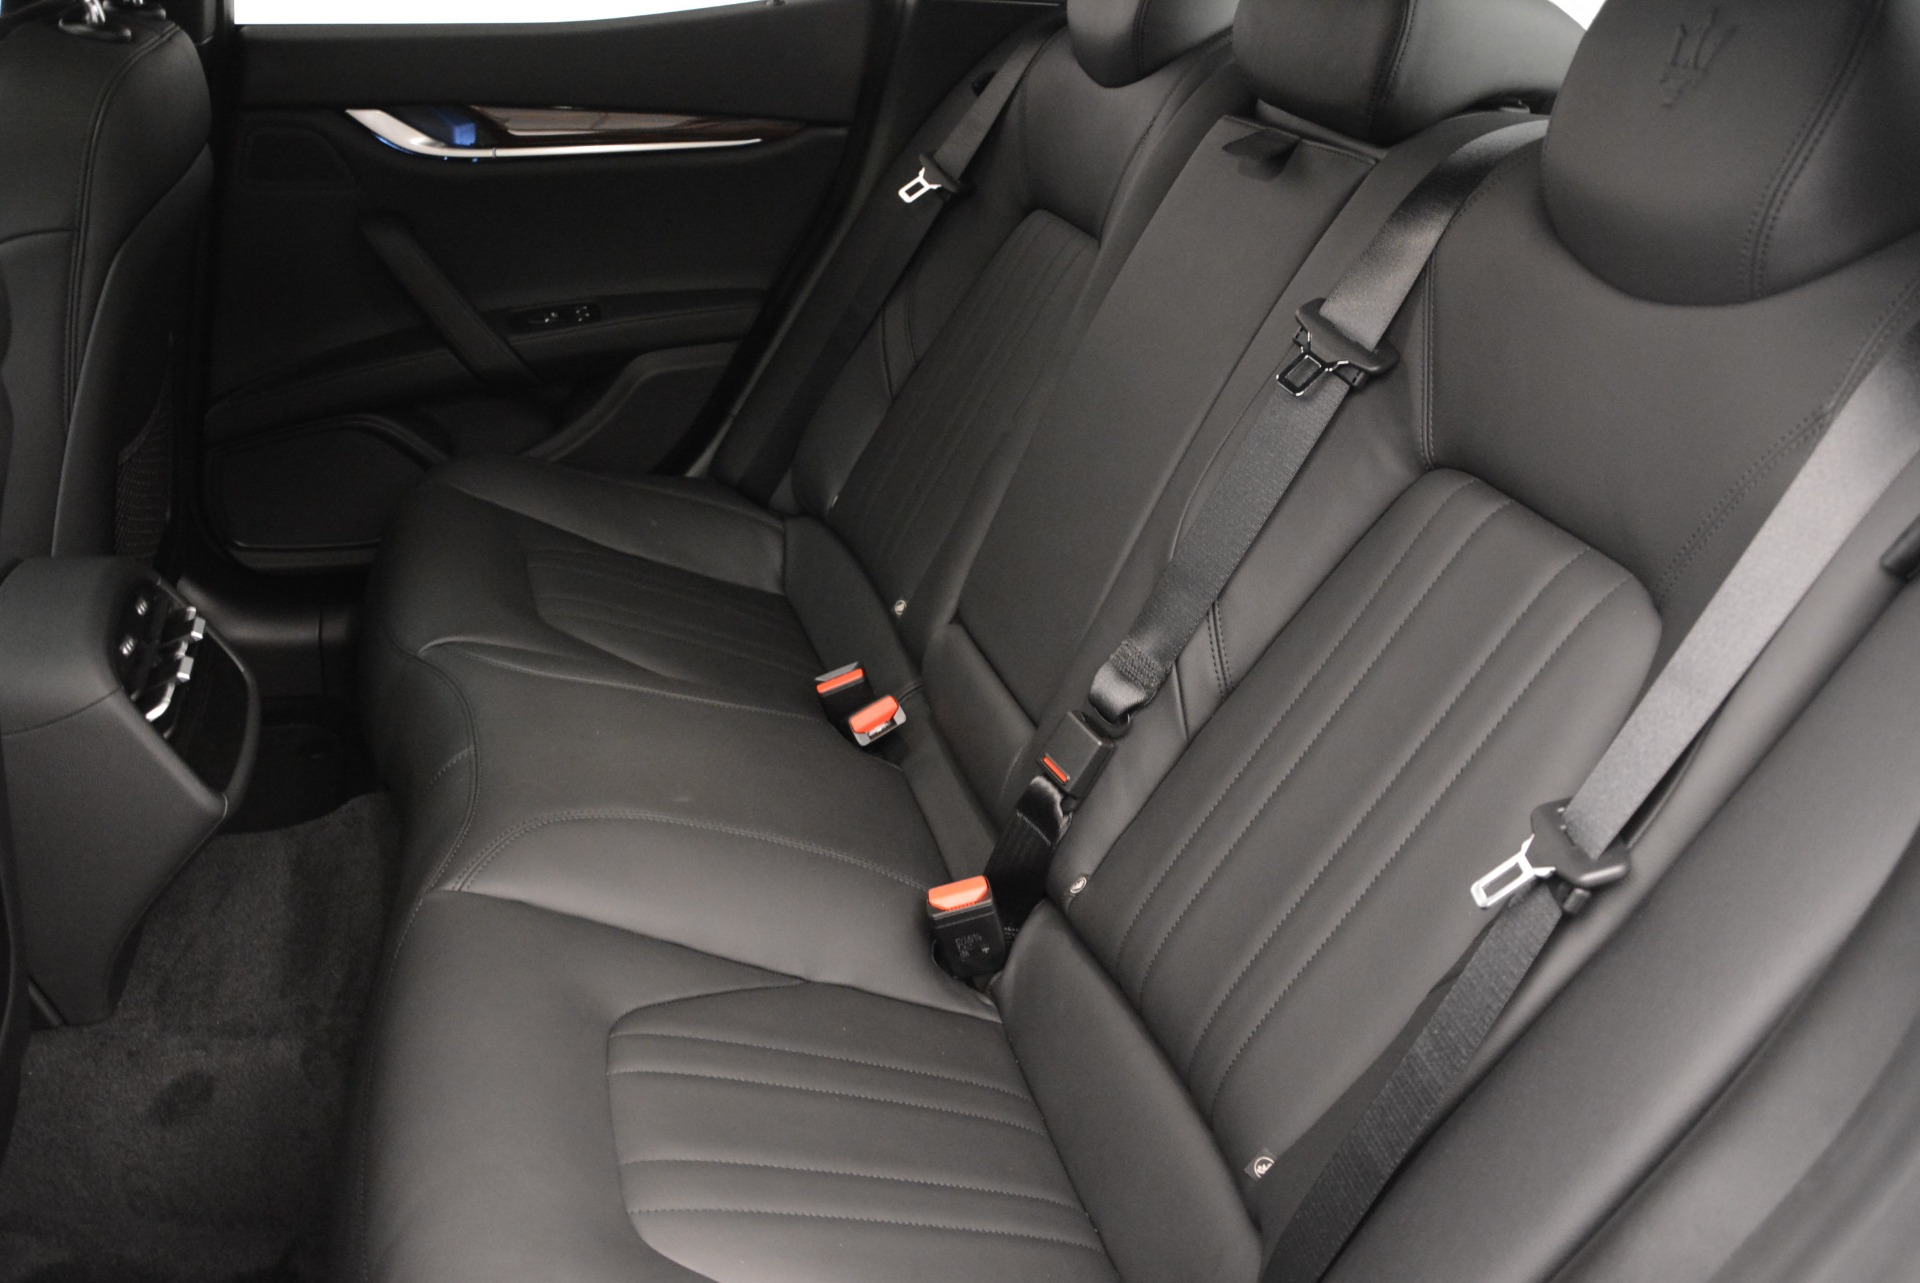 Used 2014 Maserati Ghibli S Q4 For Sale In Westport, CT 2562_p19